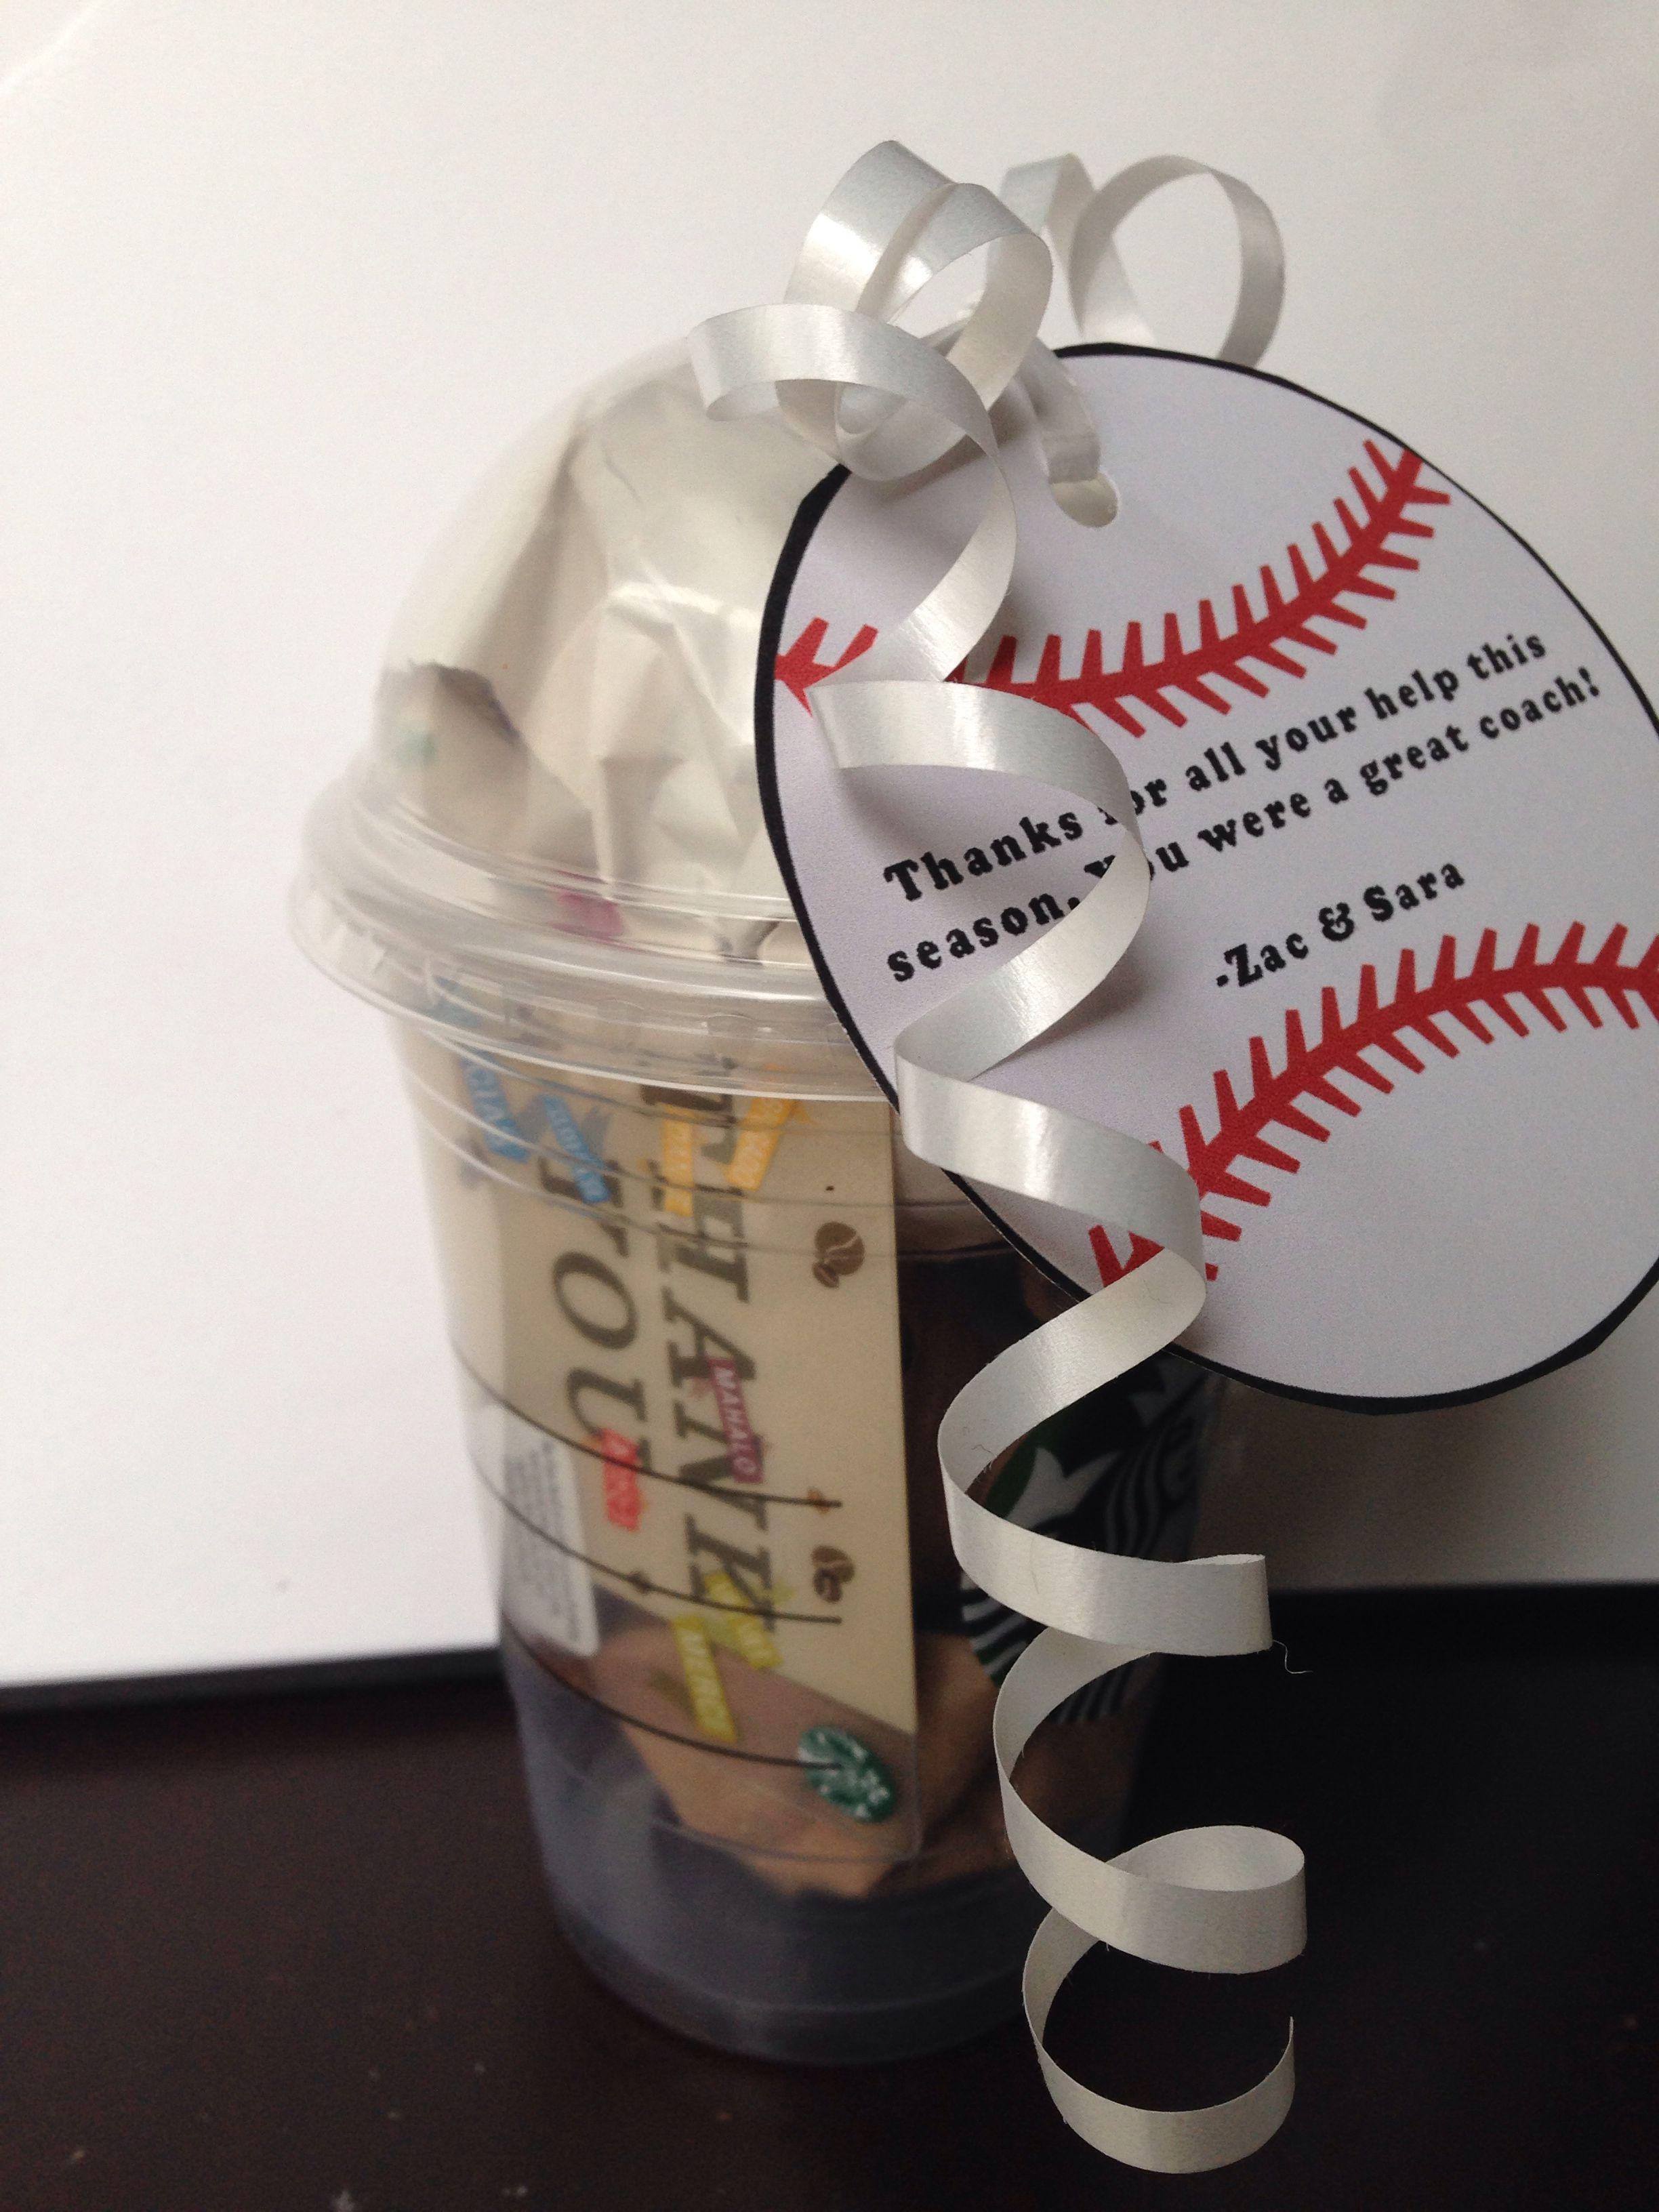 Thank You Gift For Tball Coach Teacher Treats Teacher Gifts Coach Gifts